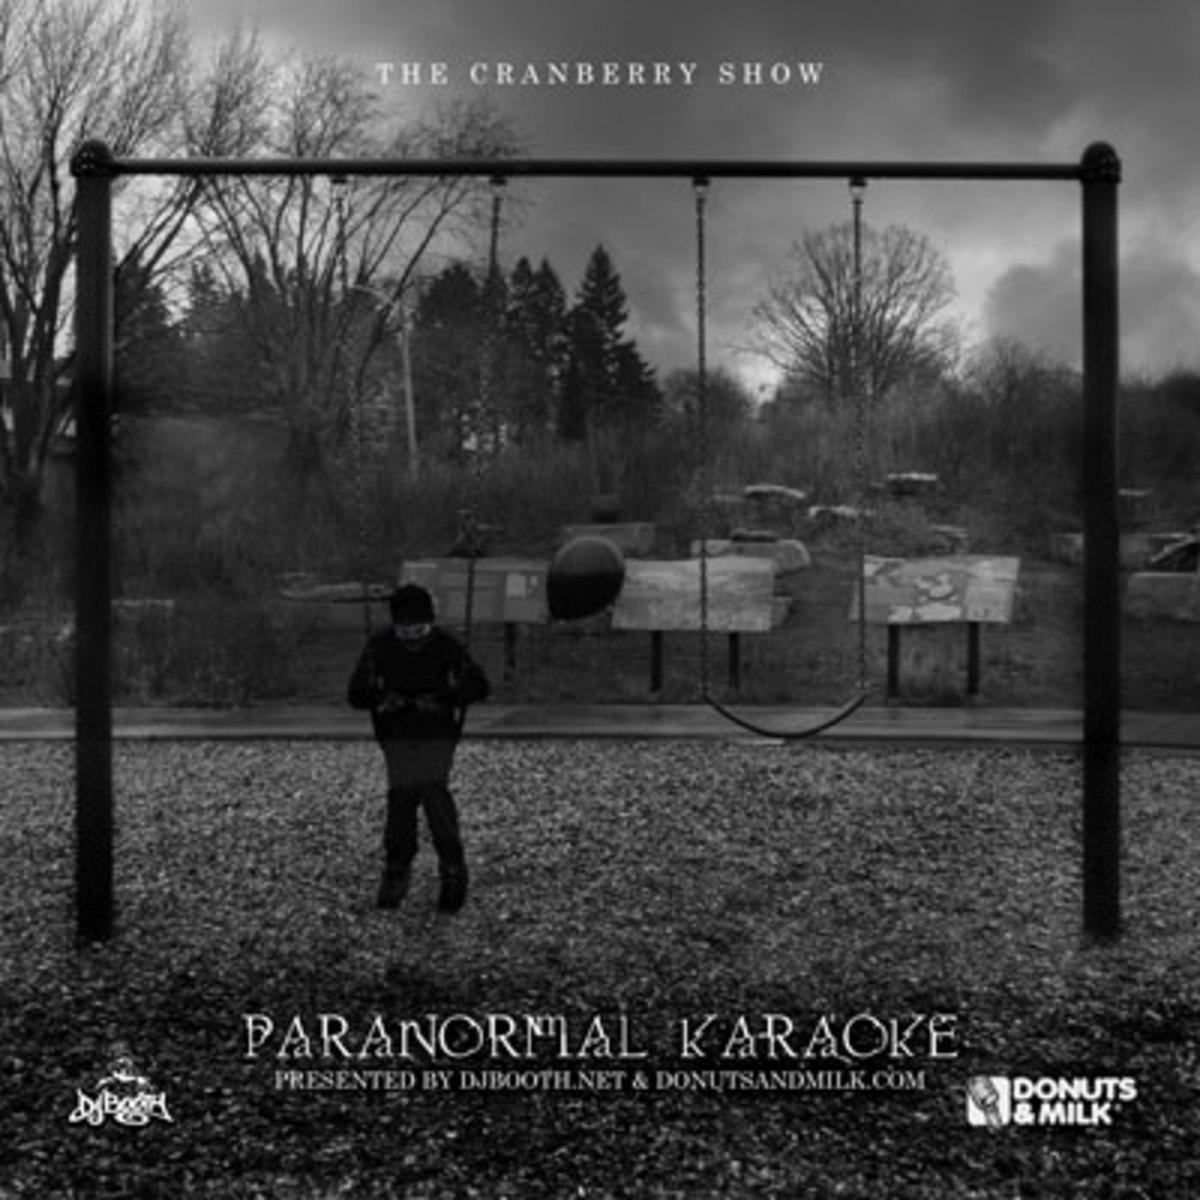 thecranberryshow-paranormalkaraoke.jpg